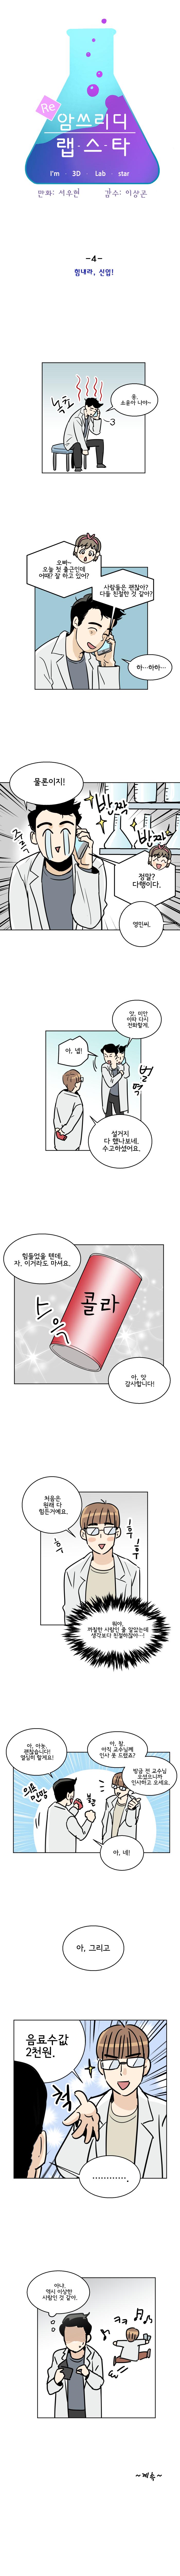 RE암쓰리디랩스타_04